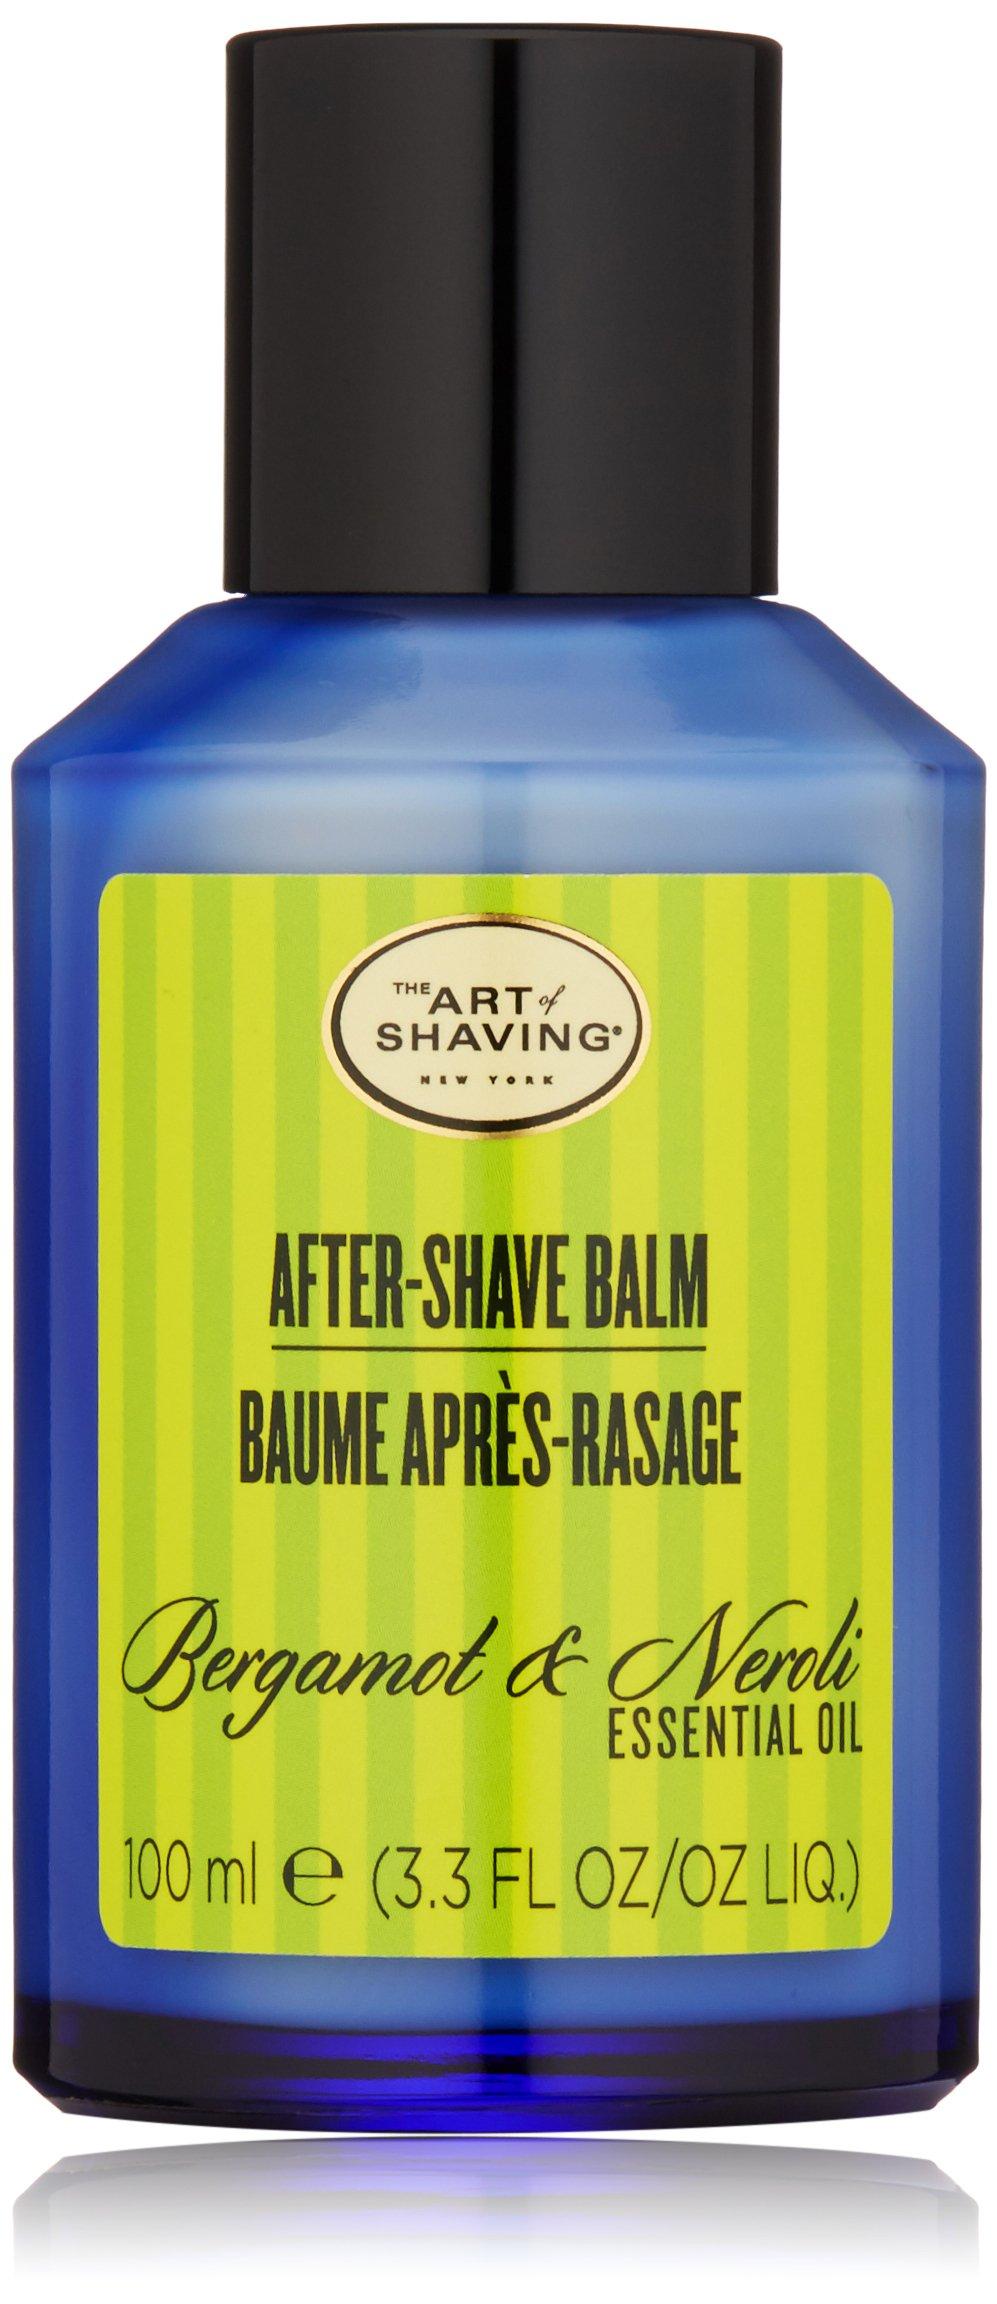 The Art of Shaving Bergamot & Neroli After-Shave Balm, 3.3 fl. oz.